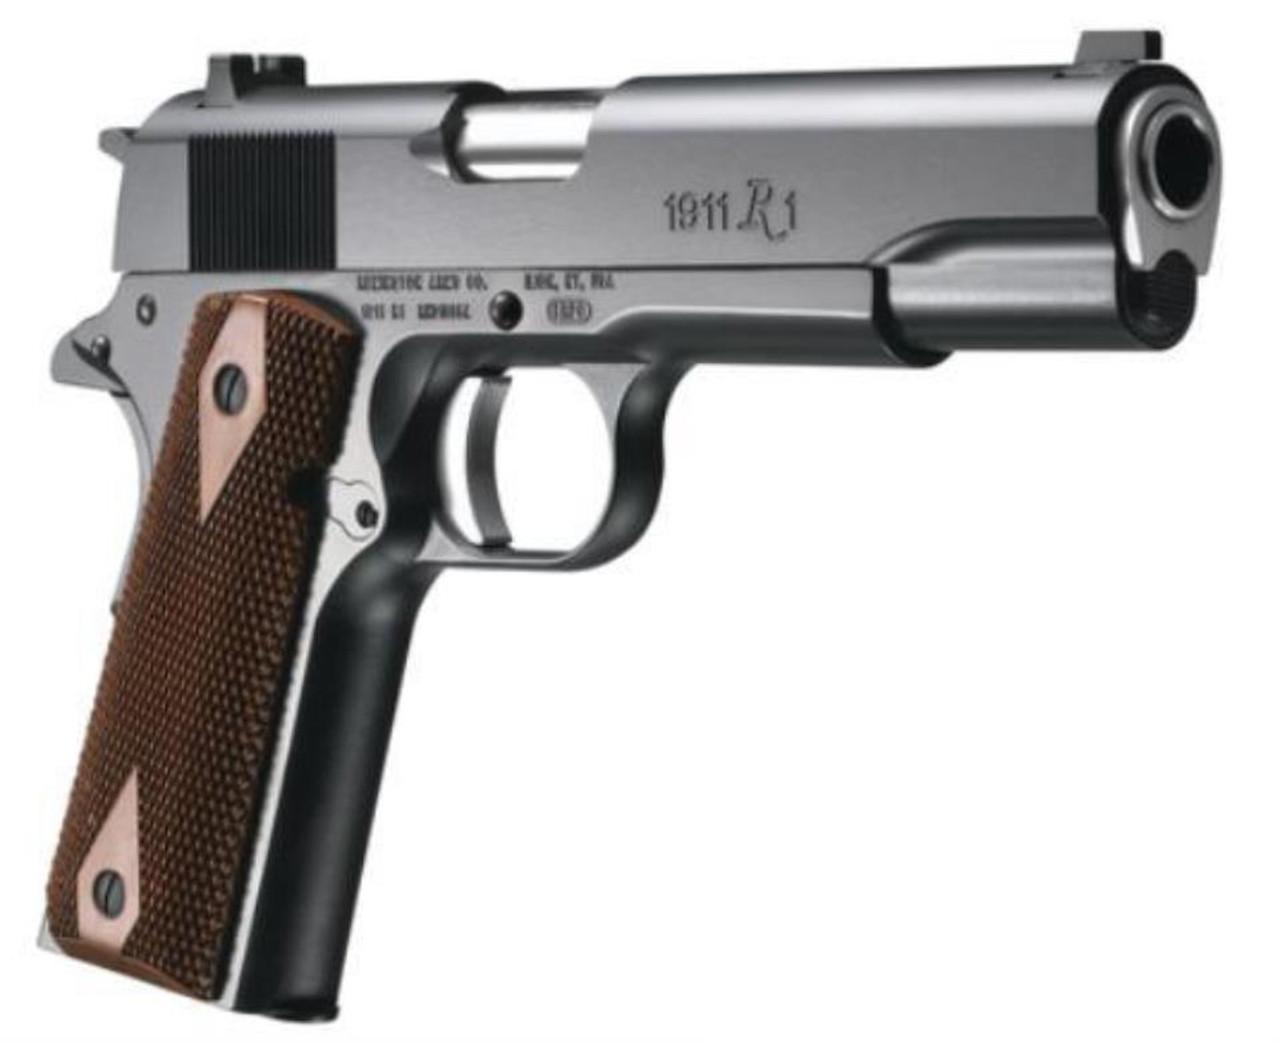 Remington 1911 Model R1 45 ACP 5